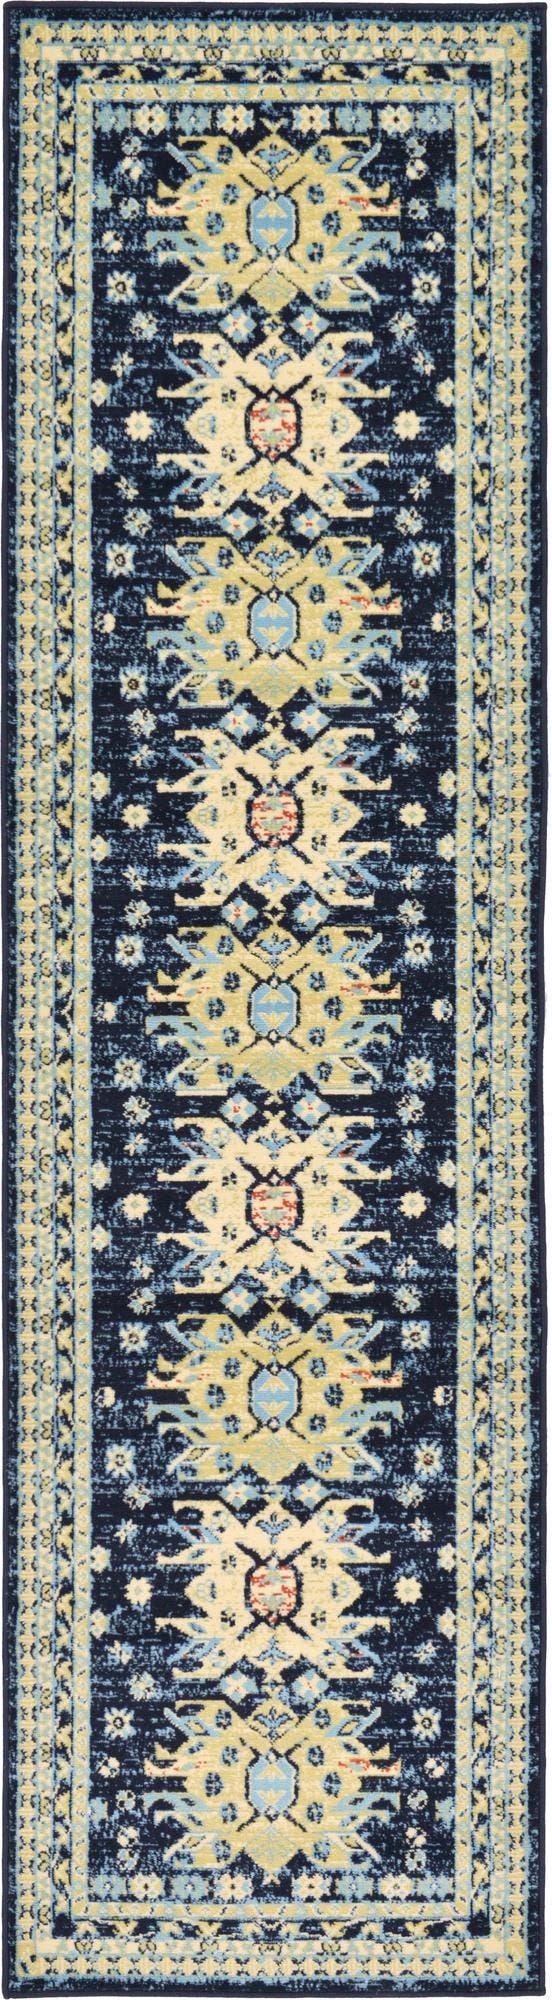 2' 7 x 10' Heriz Design Runner Rug main image